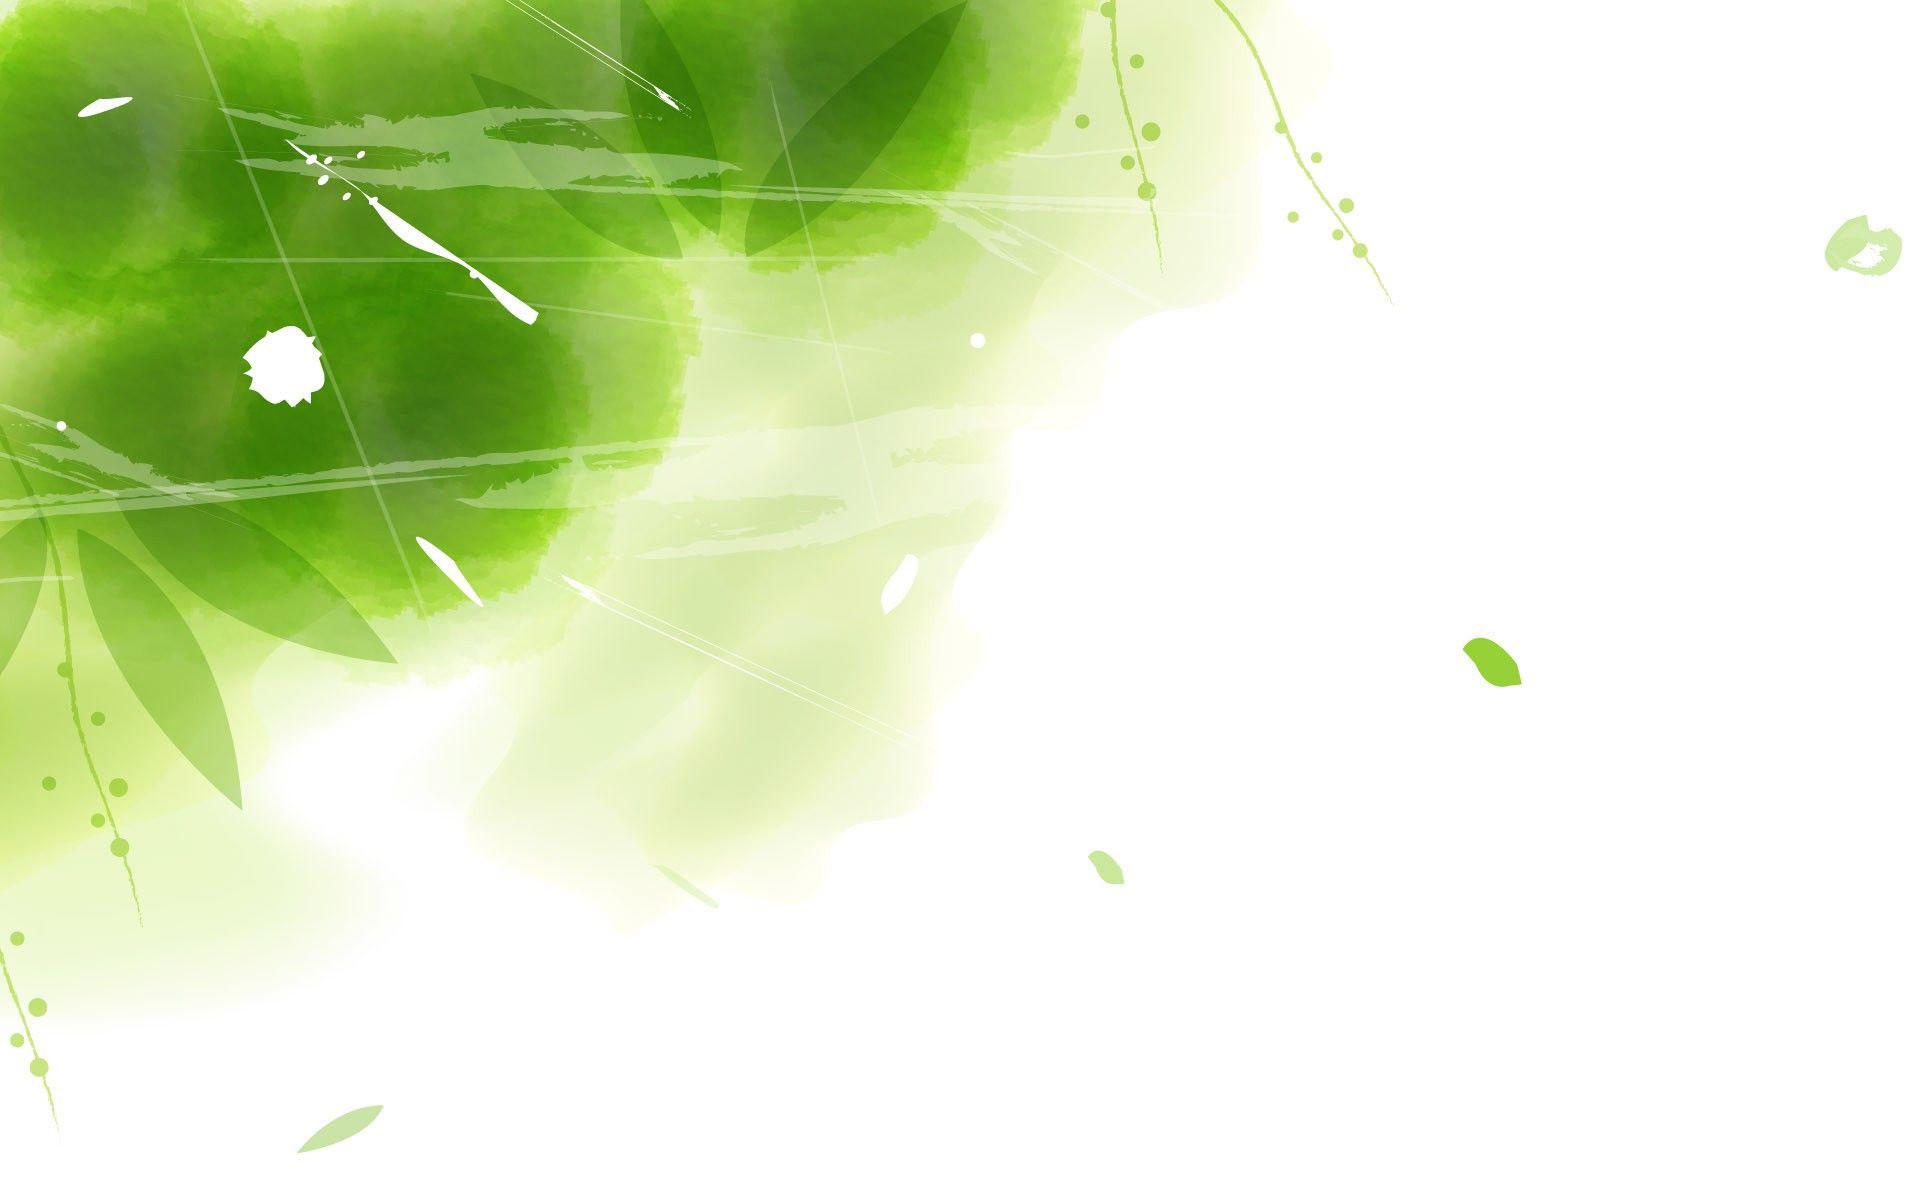 leaf, green, nature, leaves, background, wallpaper #2211